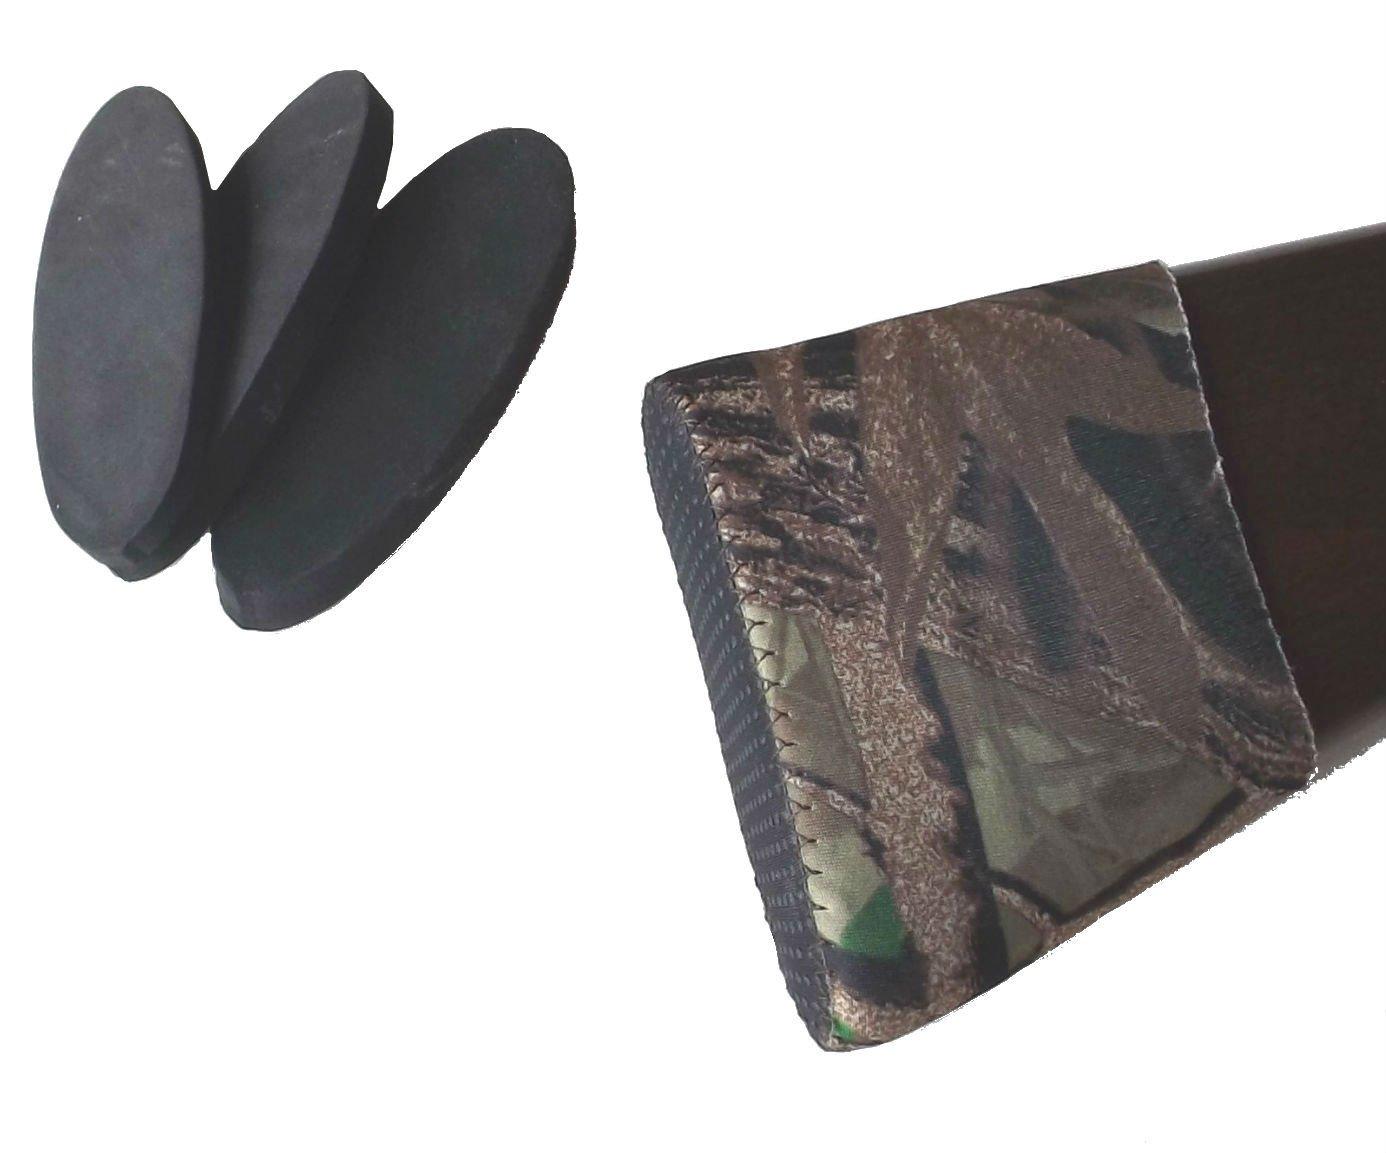 Maverick Hunting Products Slip on Neoprene Recoil Pad